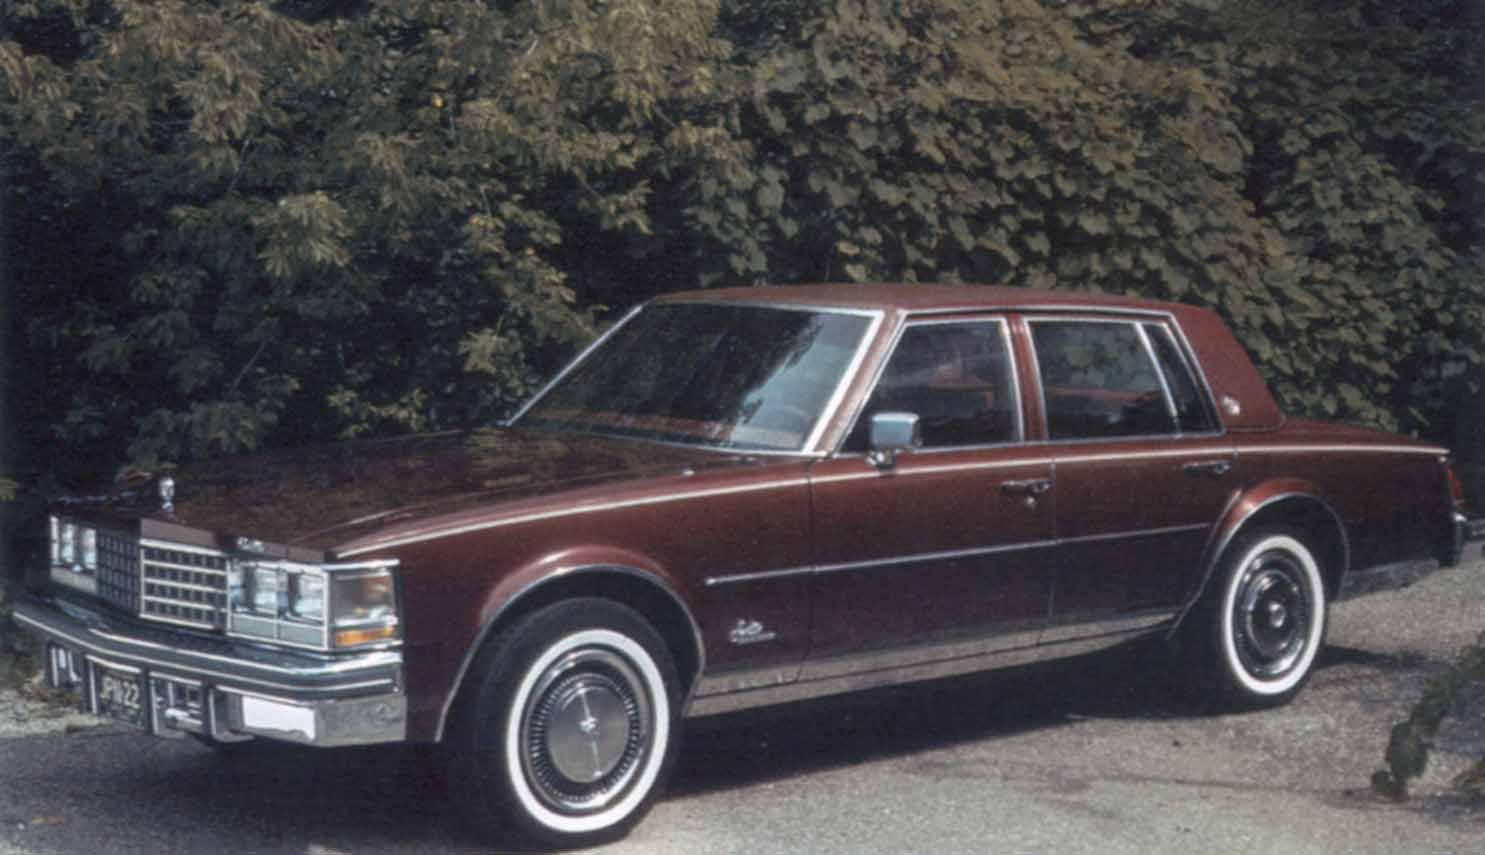 Cadillac Seville I 1975 - 1979 Sedan #1